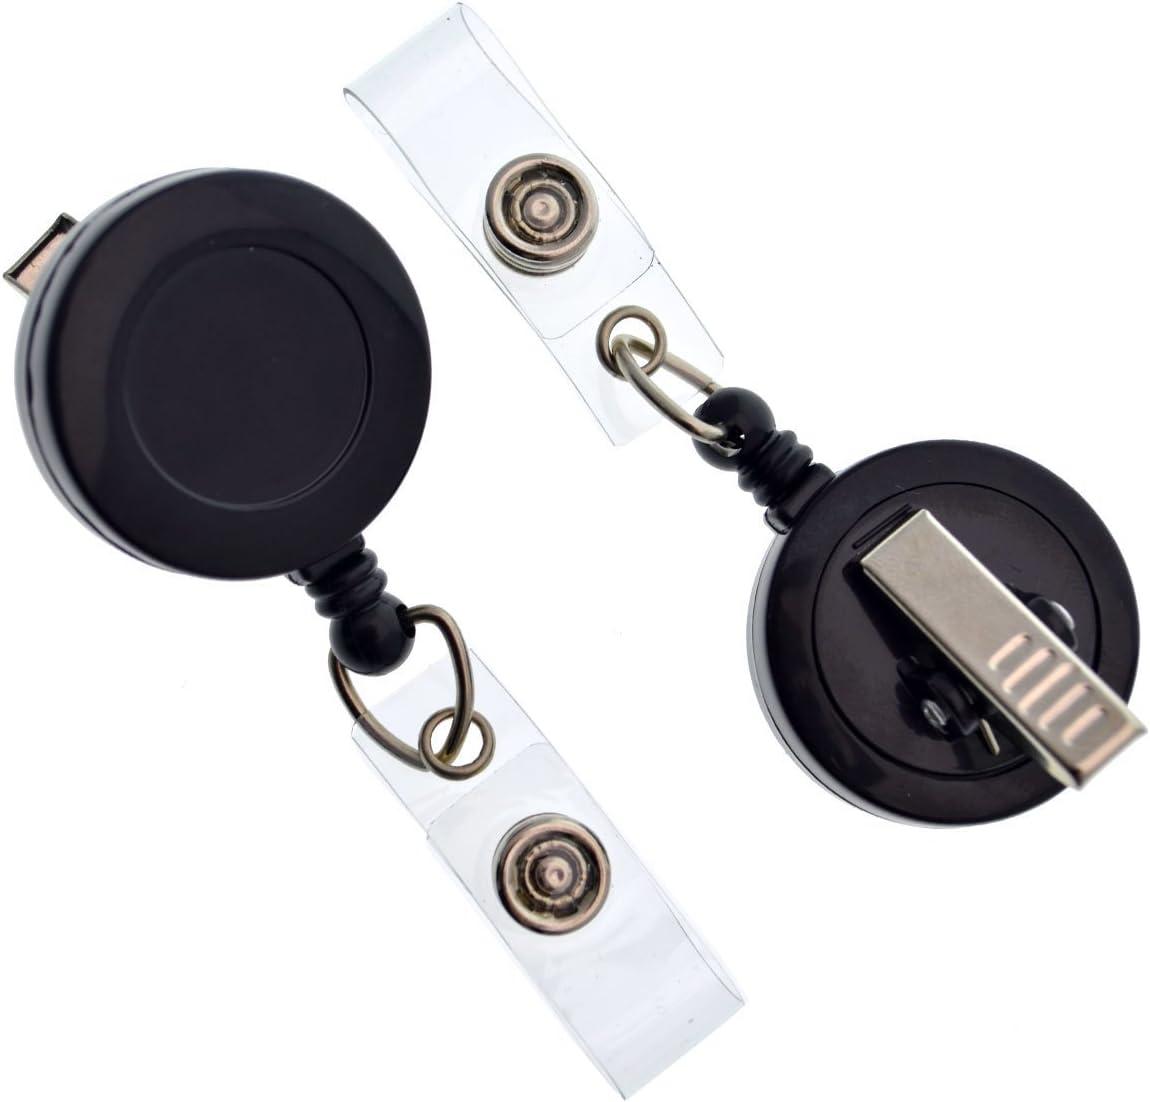 25 Pack - Bulk Premium 4 years warranty Black Alliga New product!! with Retractable Badge Reels